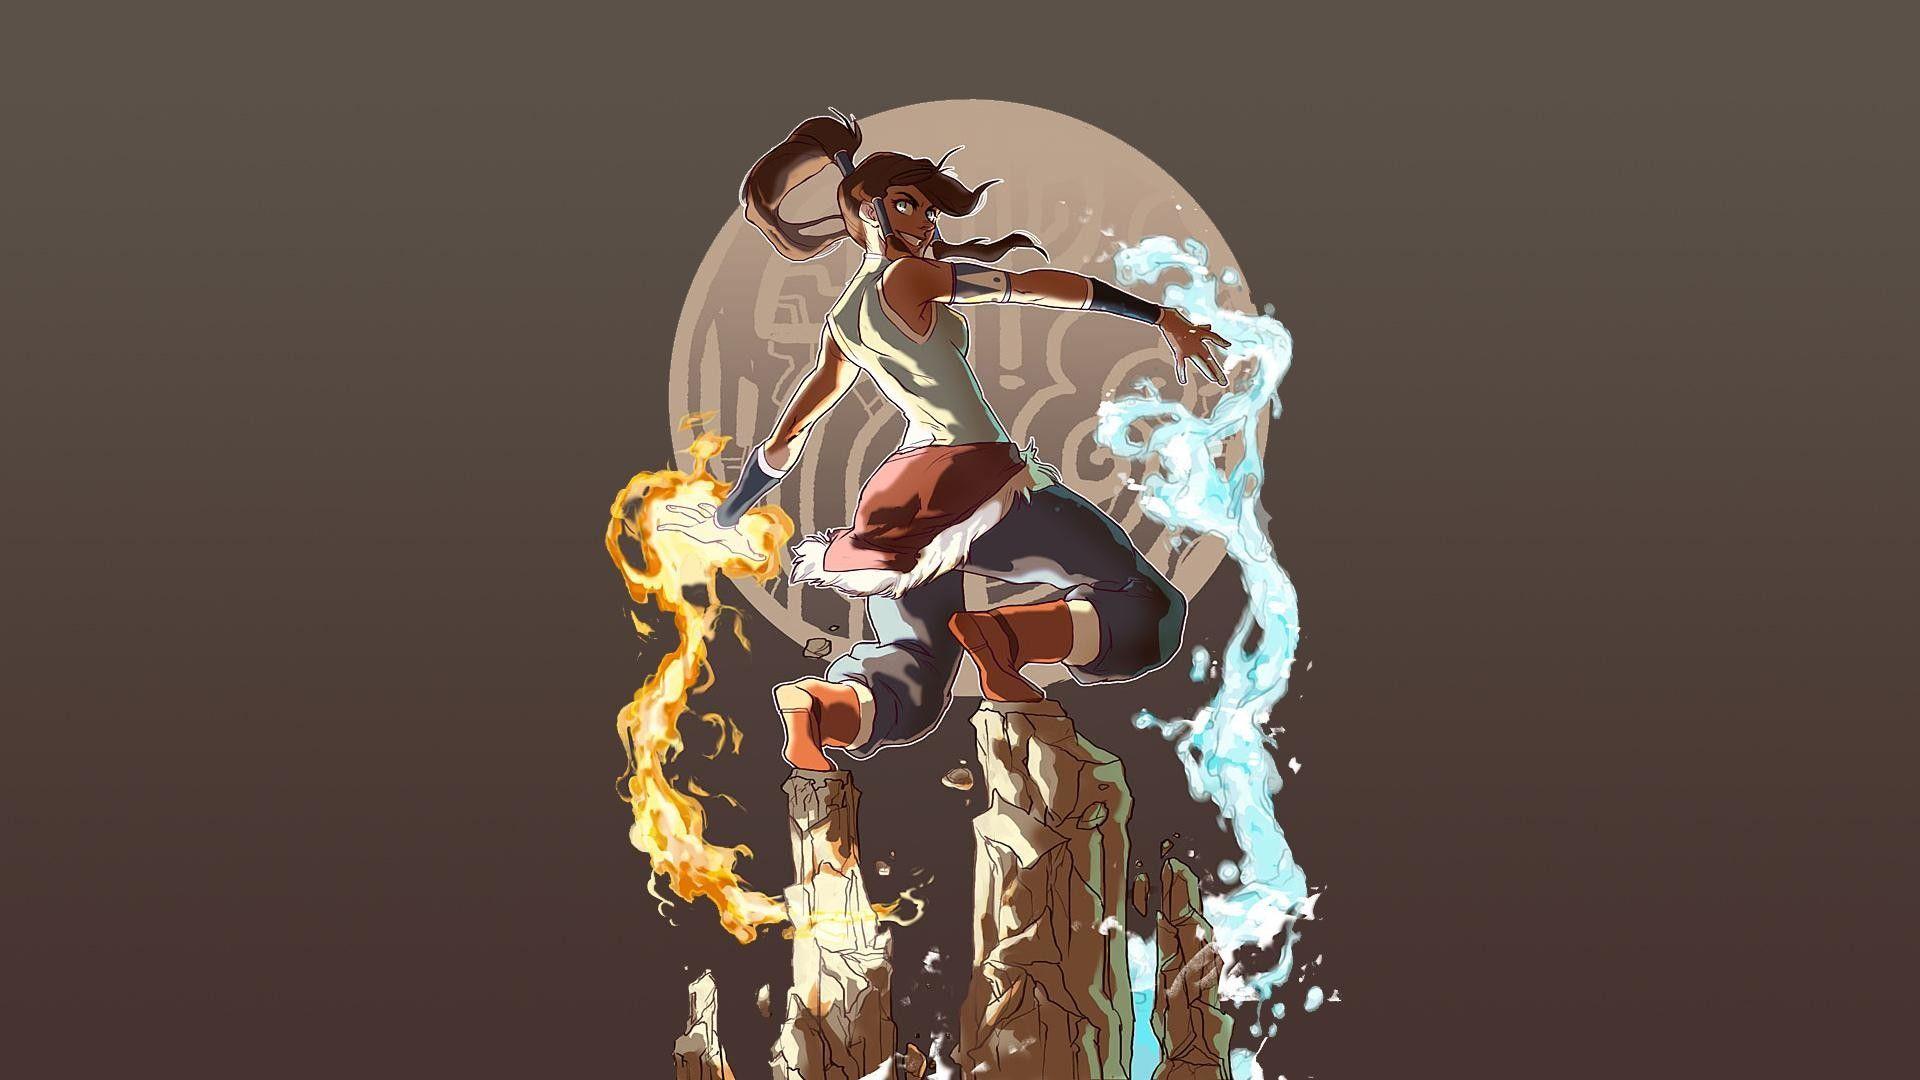 1920x1080 Avatar The Legend Of Korra Wallpapers Hd Legend Of